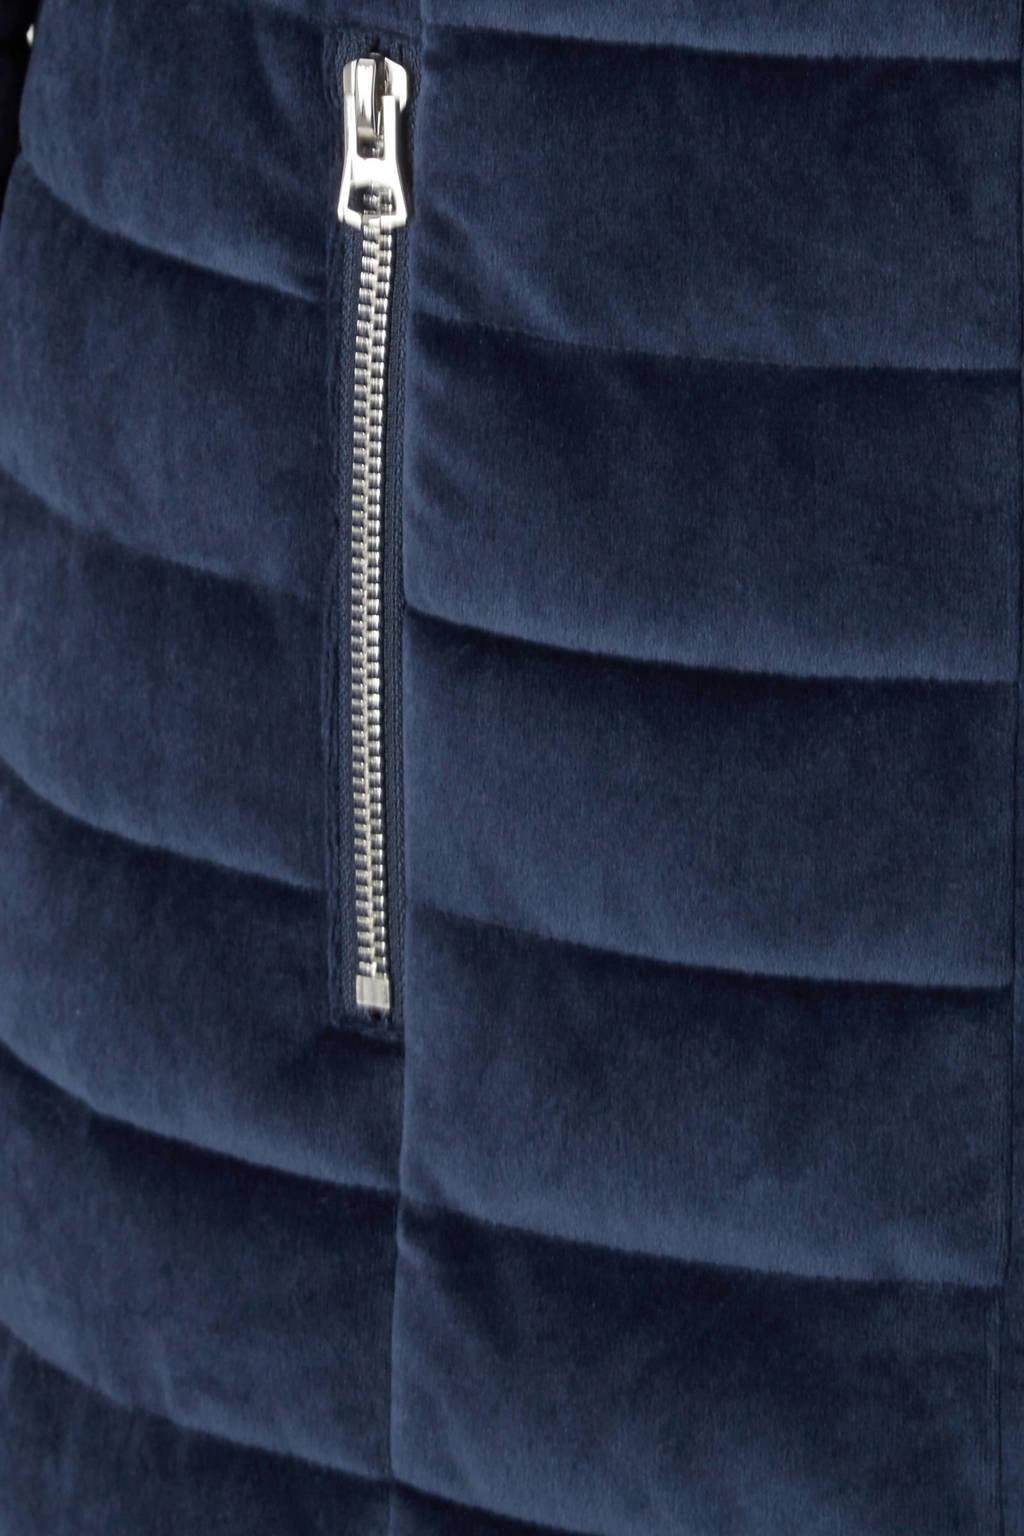 Ownfluwelen Whkmp's Ownfluwelen Whkmp's Coat Whkmp's Coat Ownfluwelen wqg5zqv